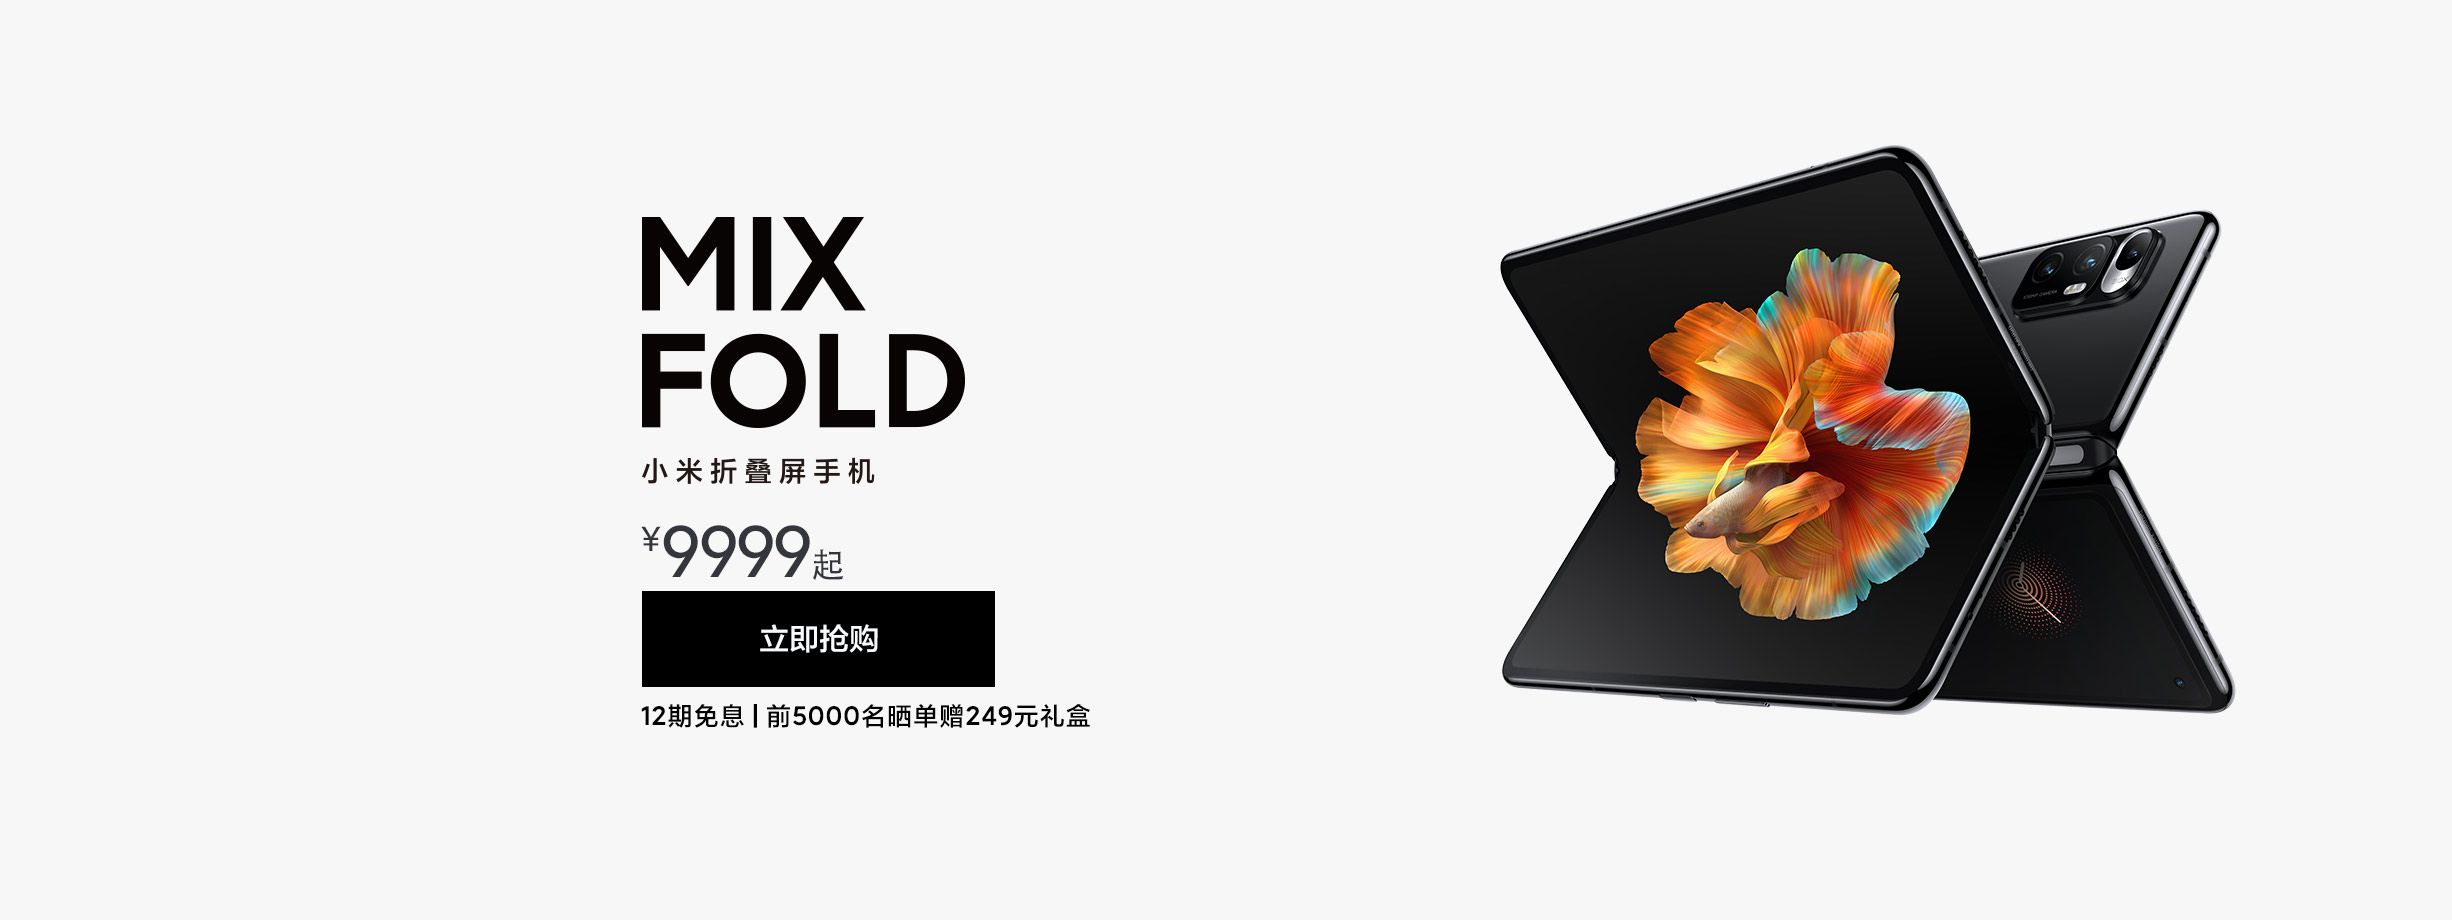 Xiaomi、フォルダブル製品Mi MIX FOLDが販売開始1分で4億元(約66億6800万)突破